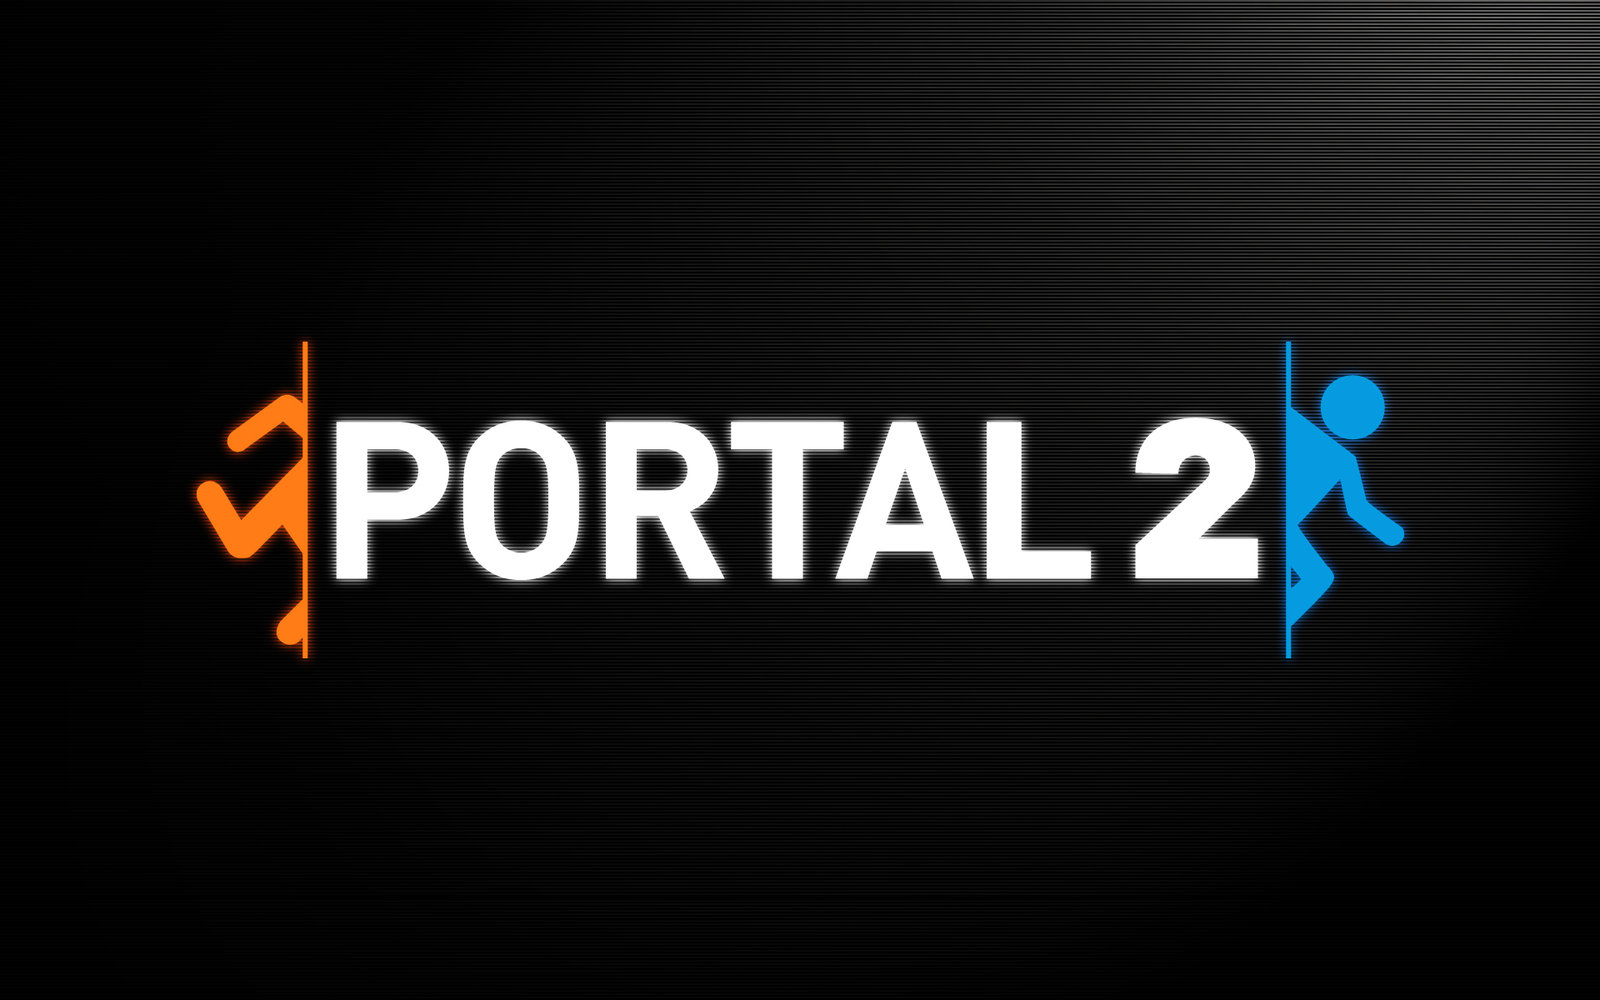 Portal 2 Wallpaper Hd Turret Portal 2 wallpaper by 1600x1000